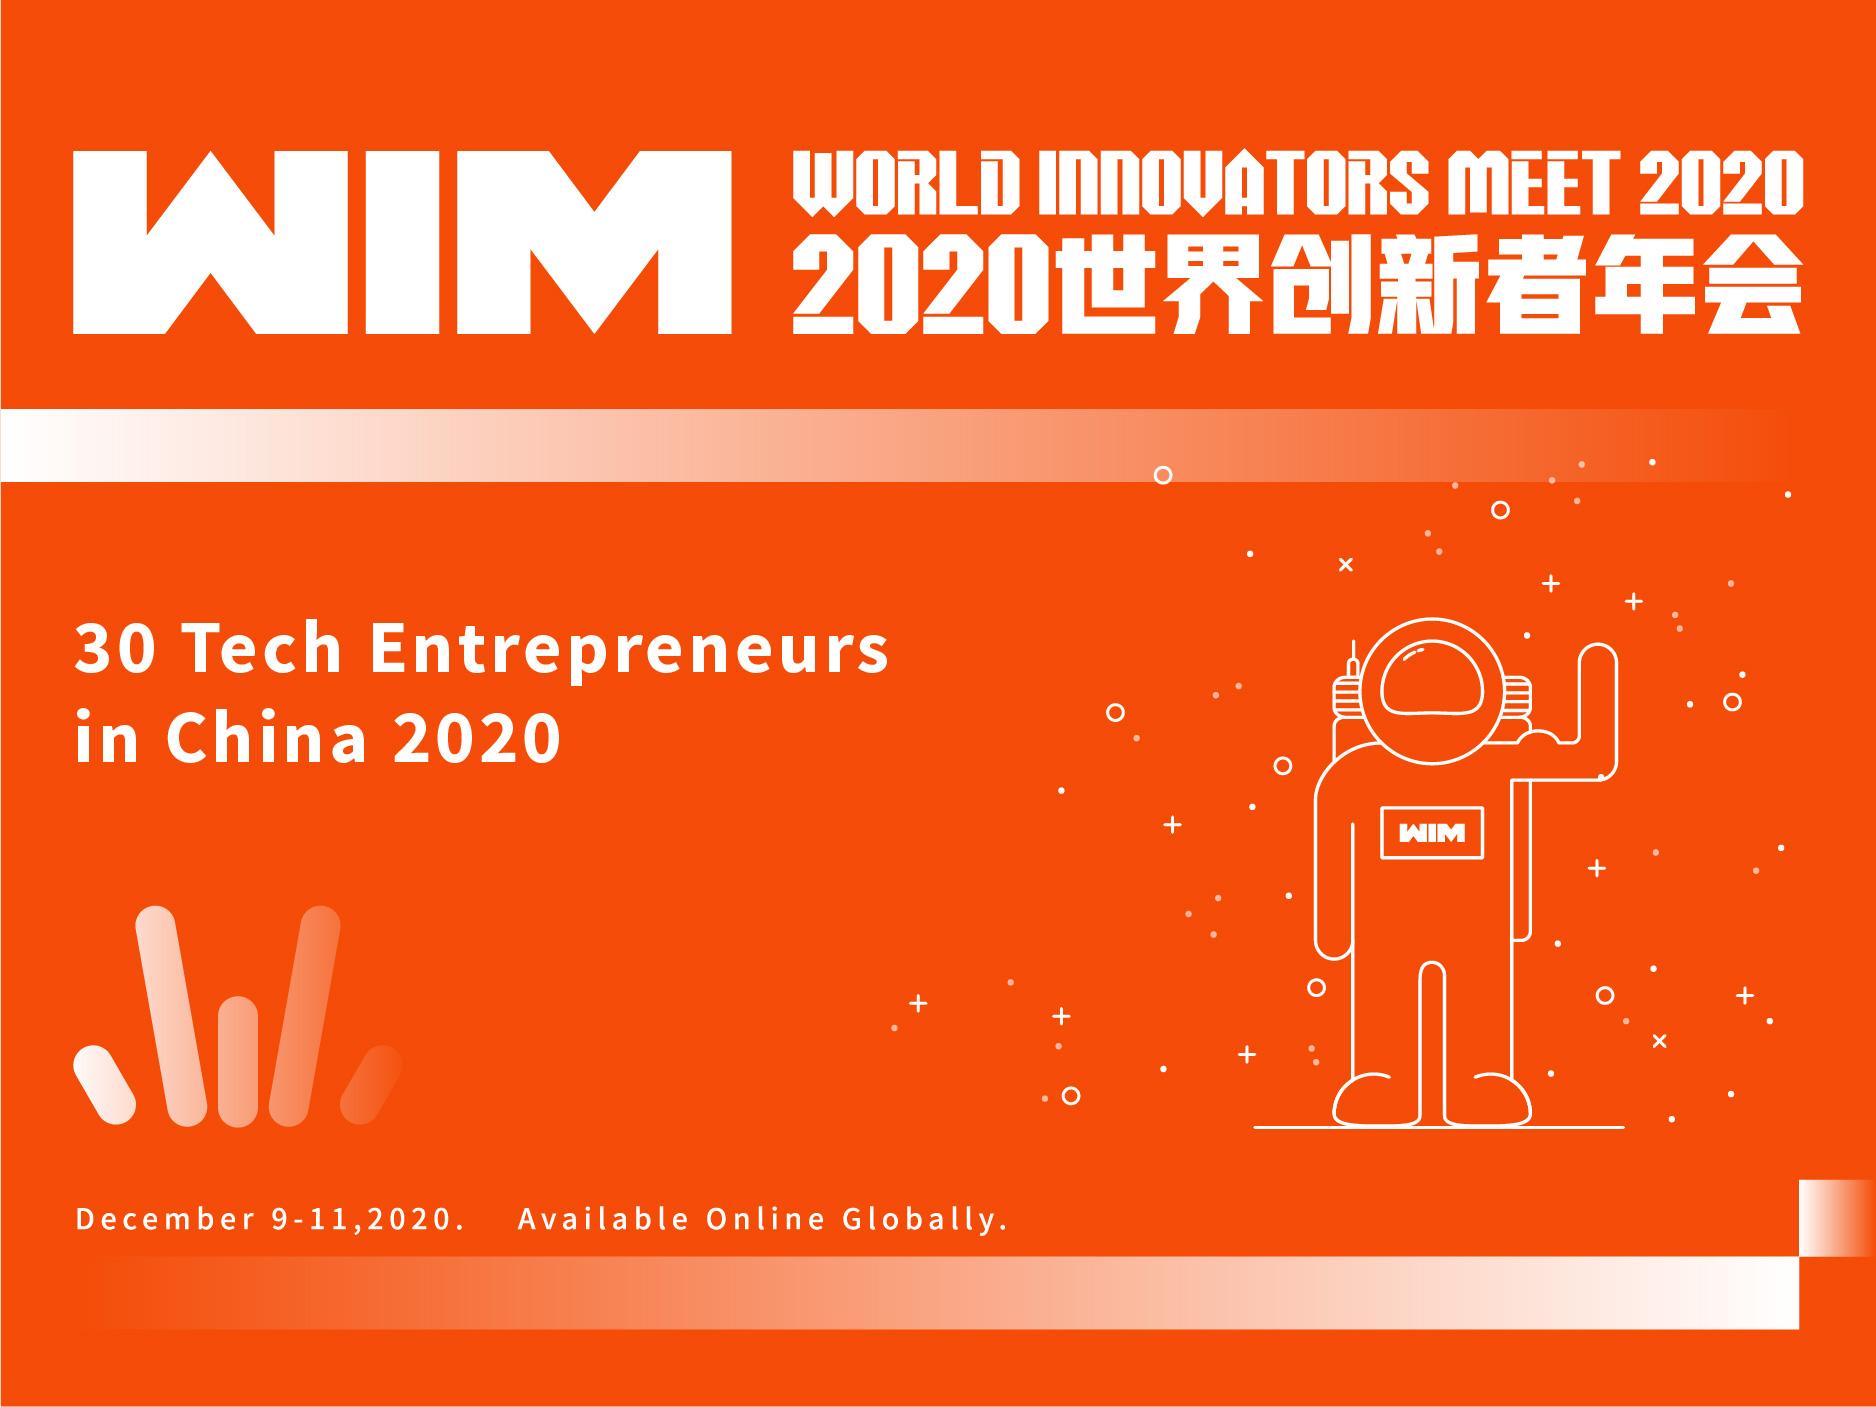 30 Technology Entrepreneurs in China 2020